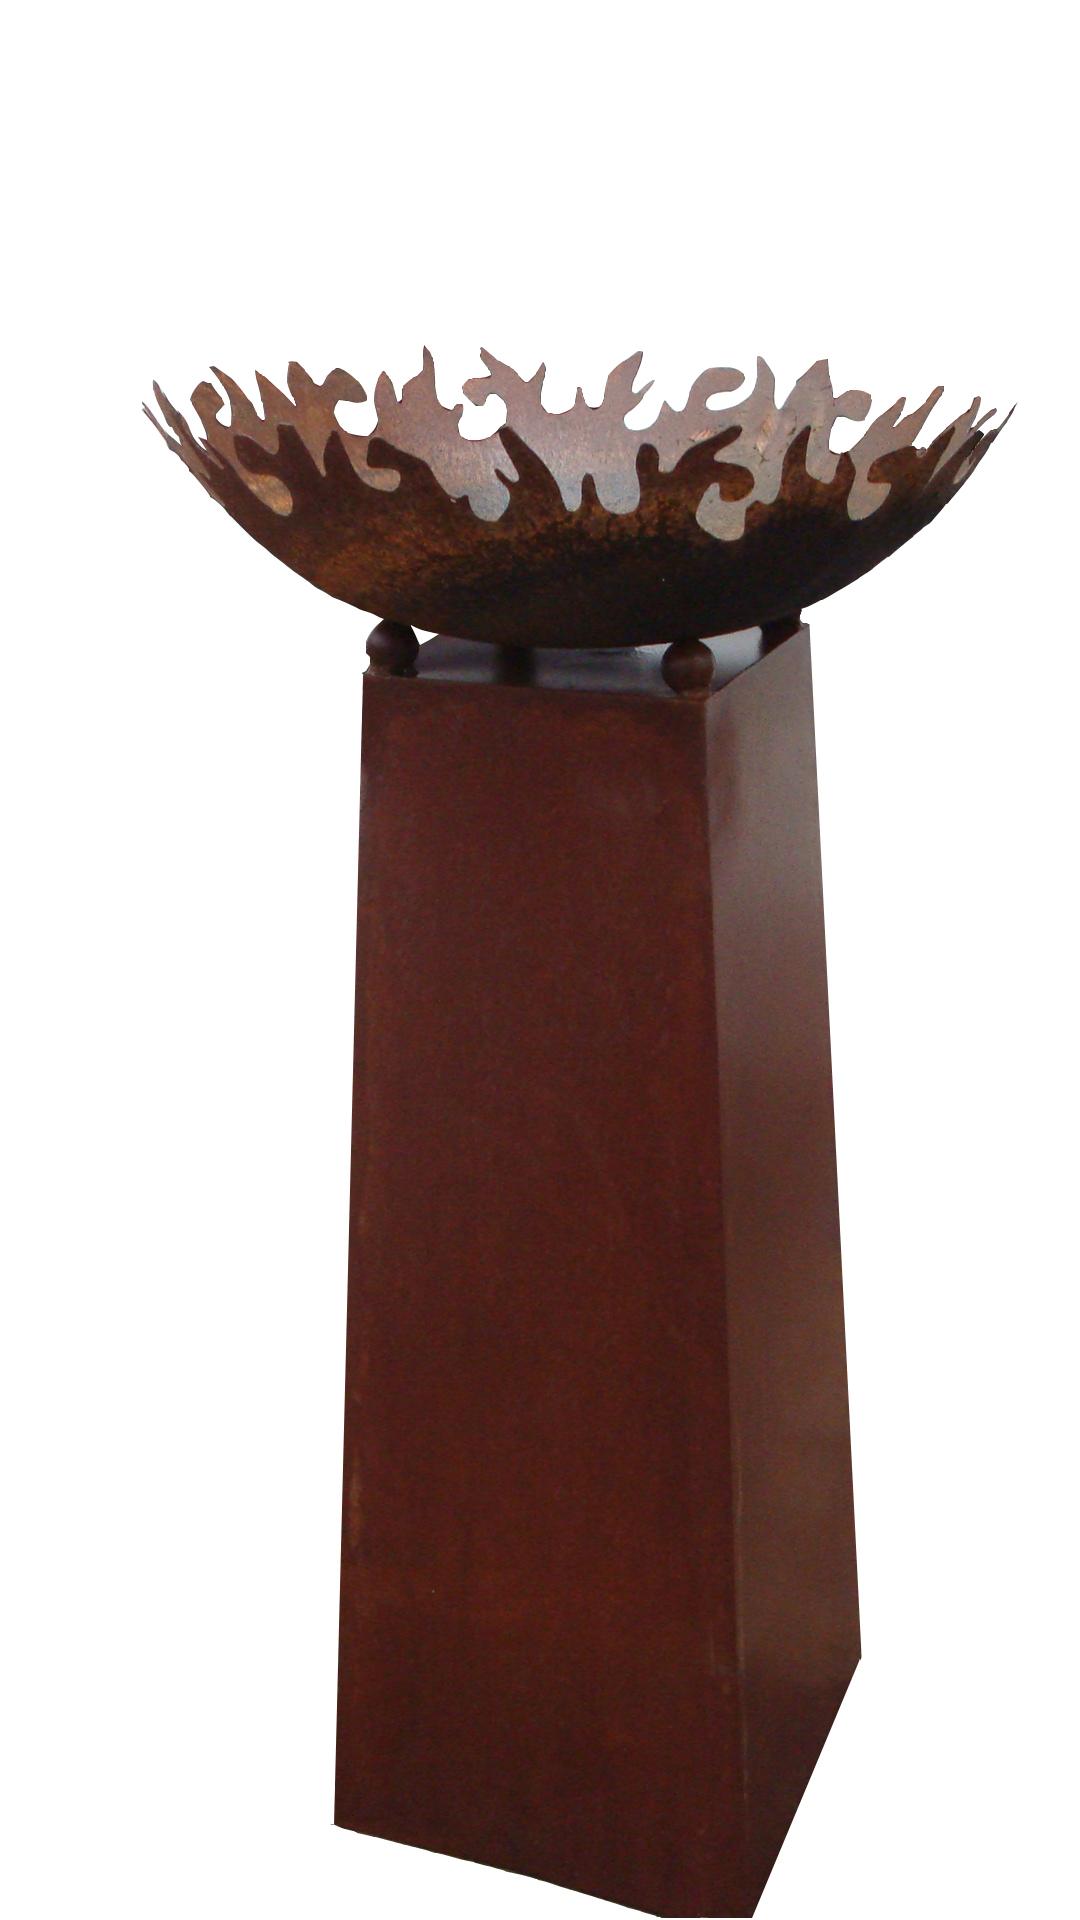 edelrost konus h100cm f r feuerschale pflanzschale gartendeko metall in 4 gr e ebay. Black Bedroom Furniture Sets. Home Design Ideas